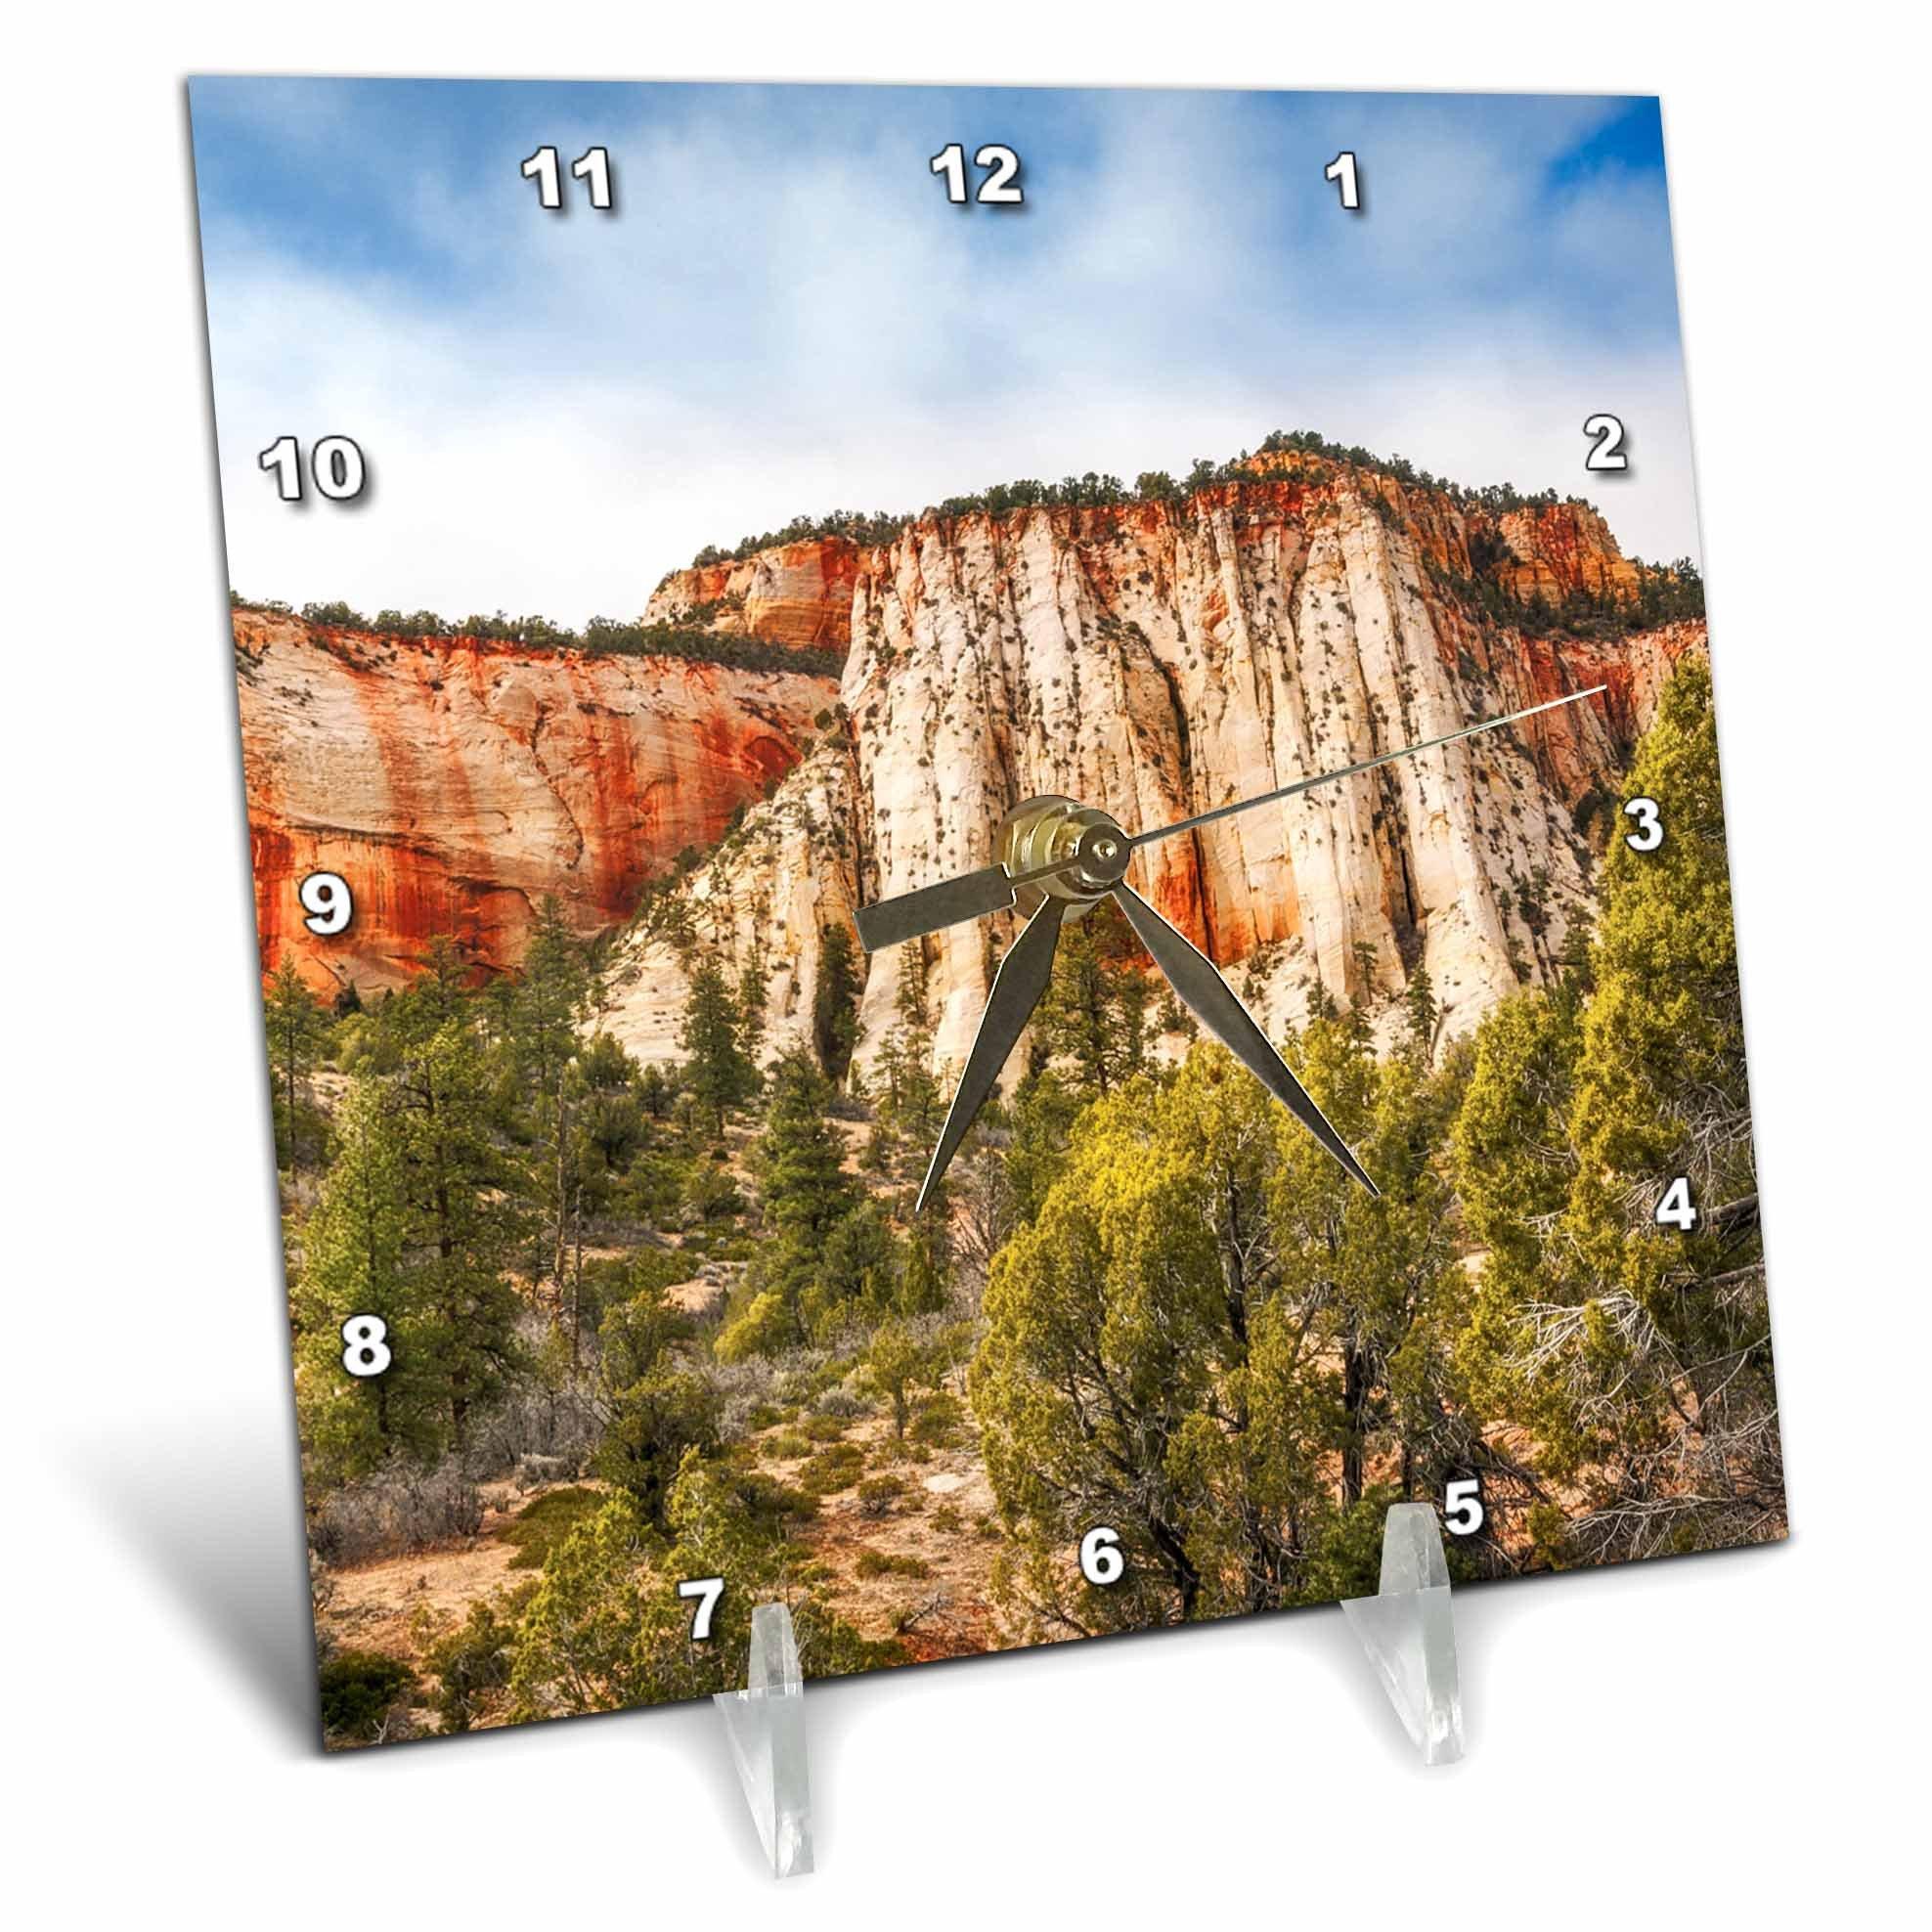 3dRose DanielaPhotography - Nature, Landscape - Mountain Range in Zion National Park, Utah, United States America - 6x6 Desk Clock (dc_282002_1)